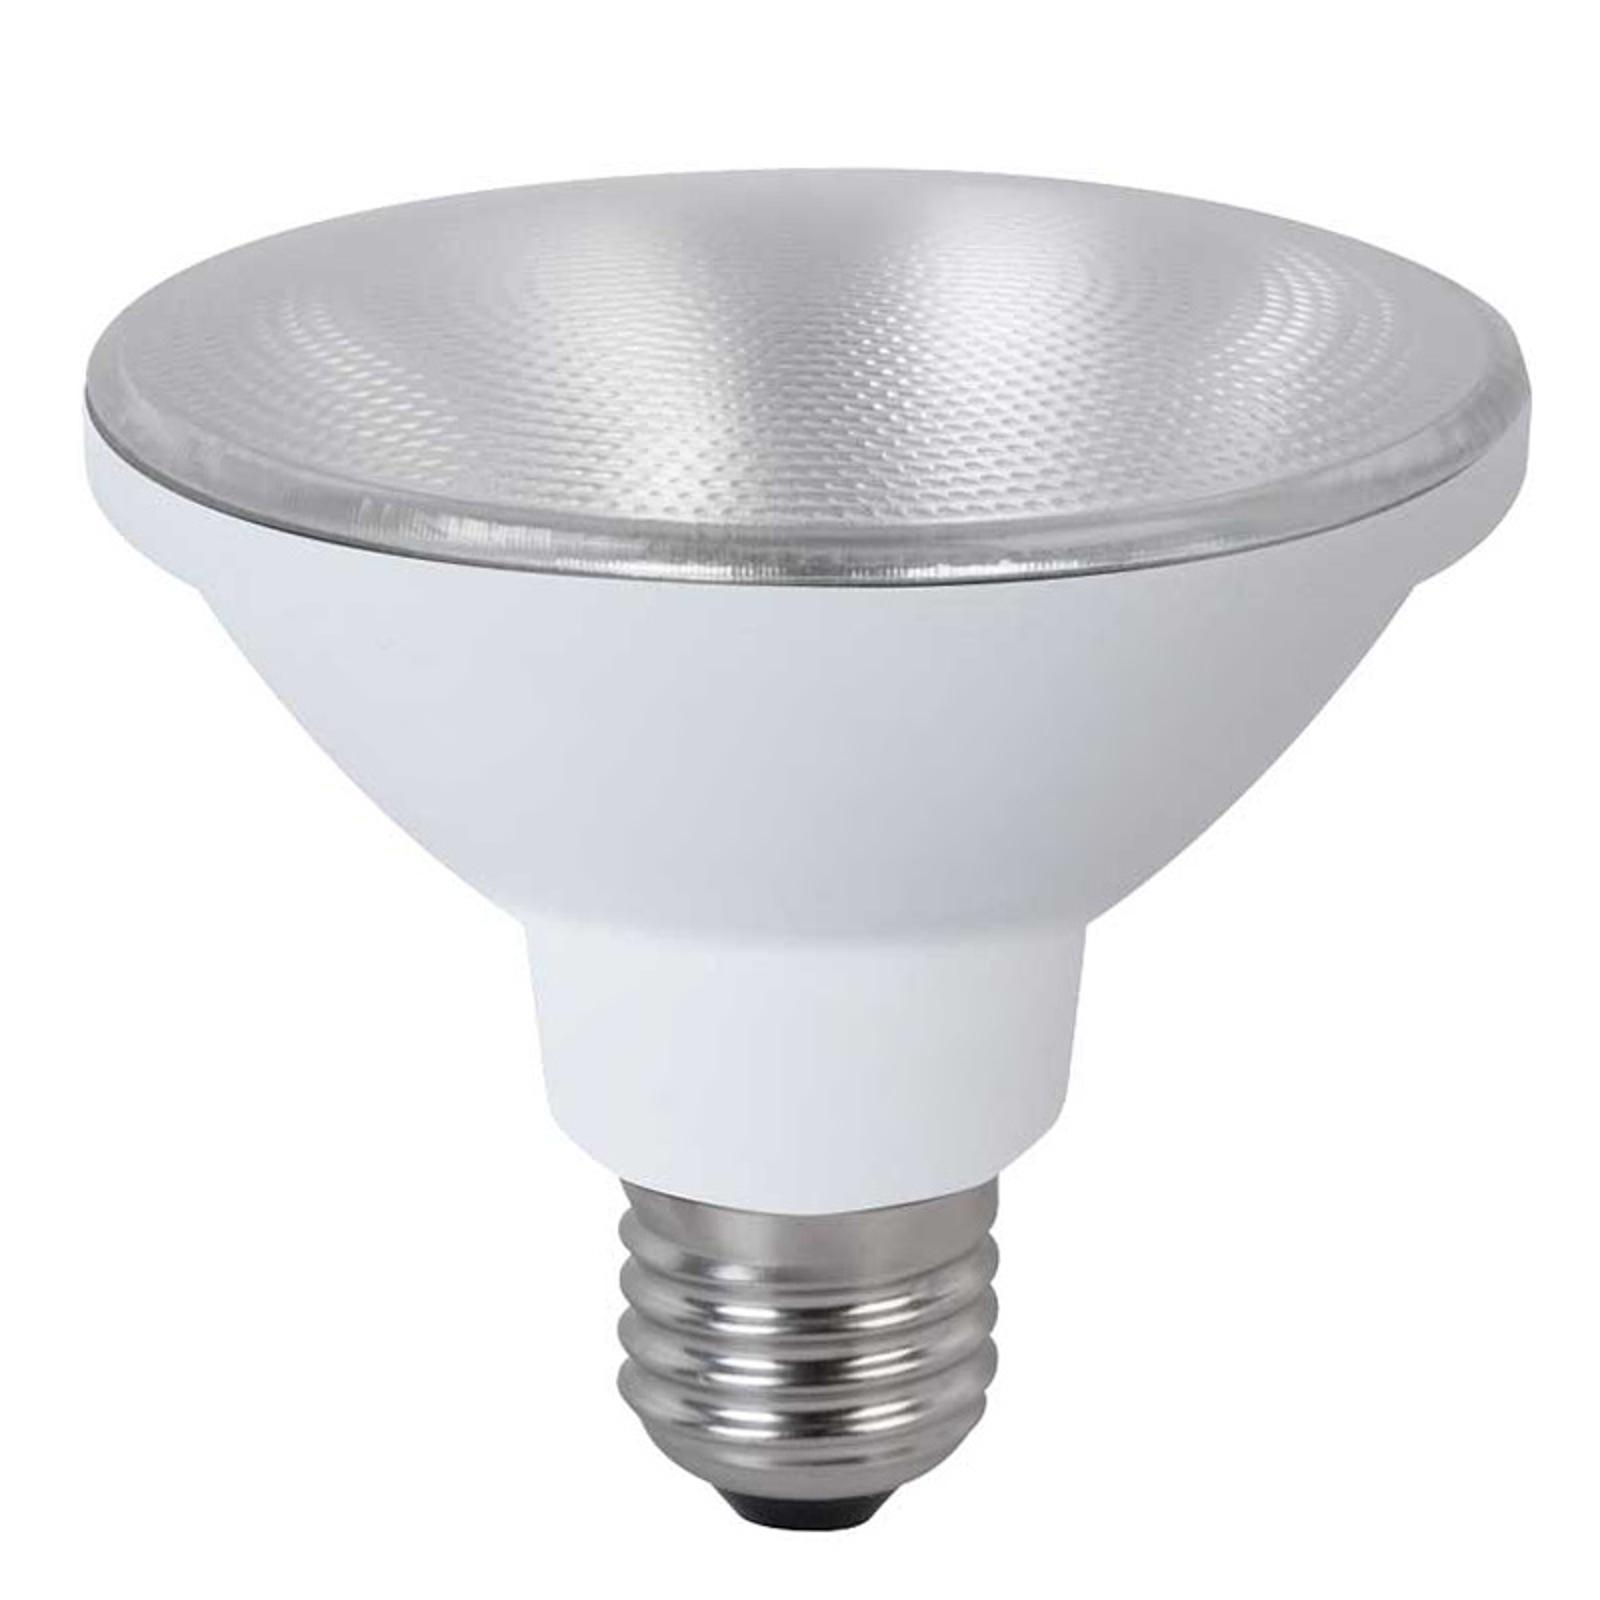 E27 10.5W LED reflector MEGAMAN PAR30 35°_6530187_1